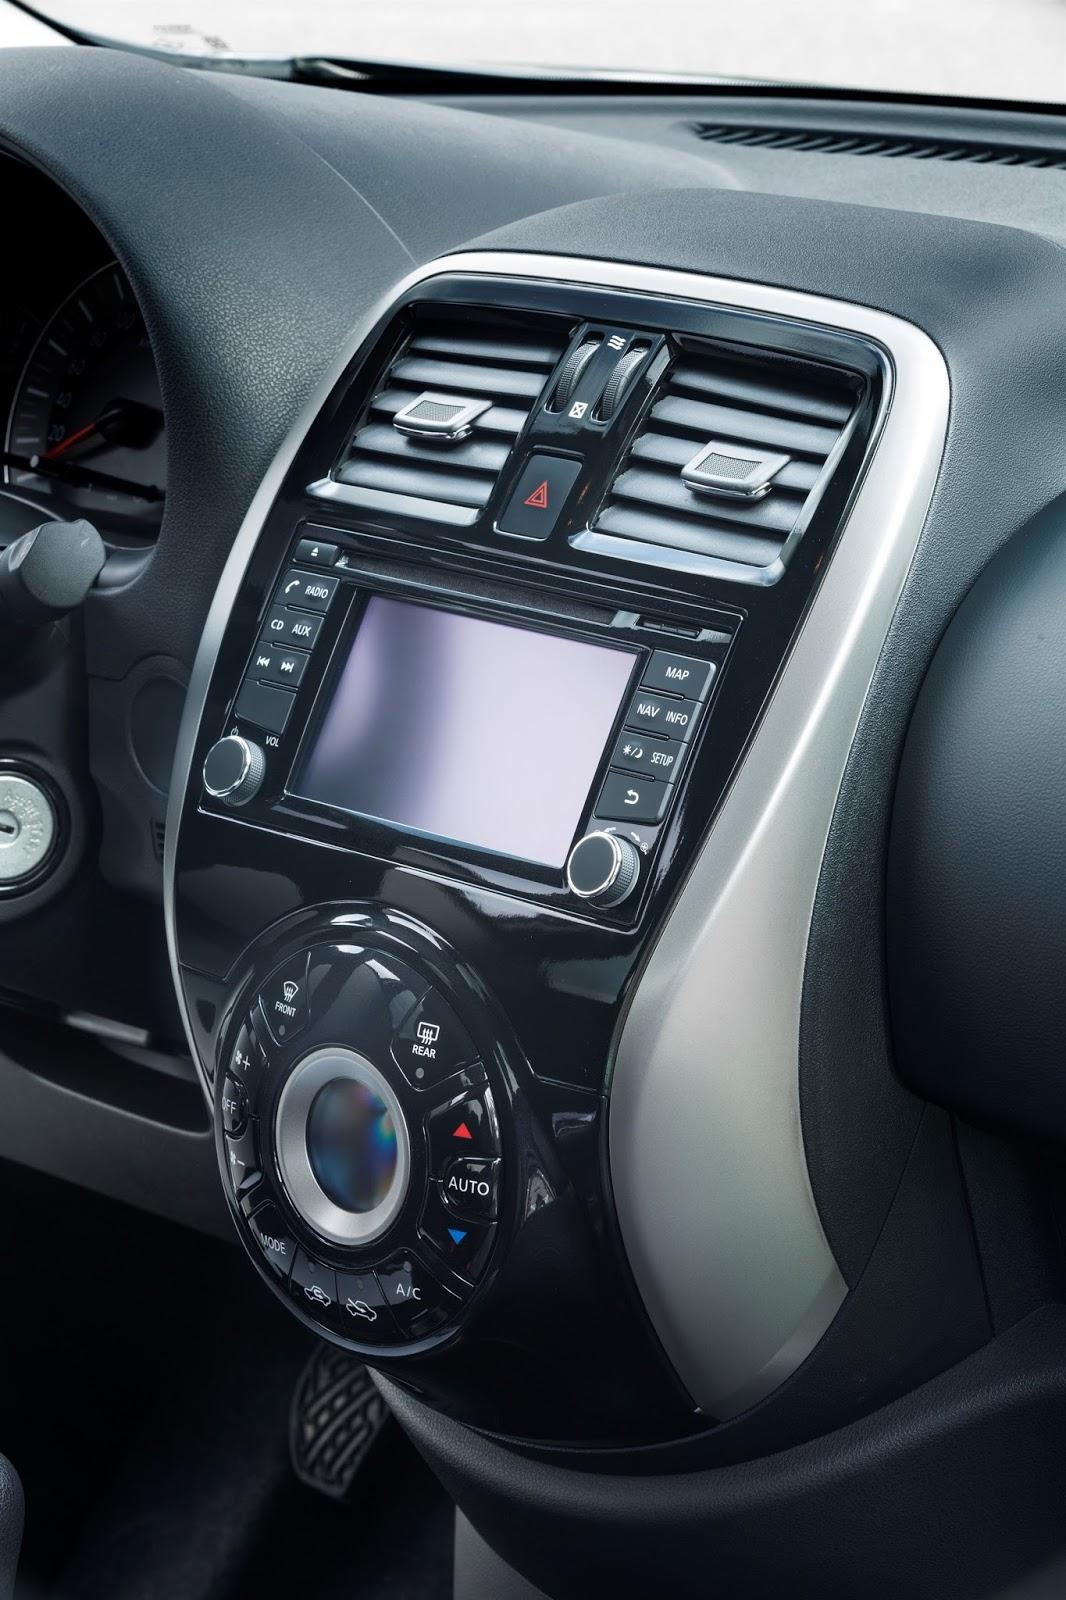 Nissan-Micra-N-Tec-10